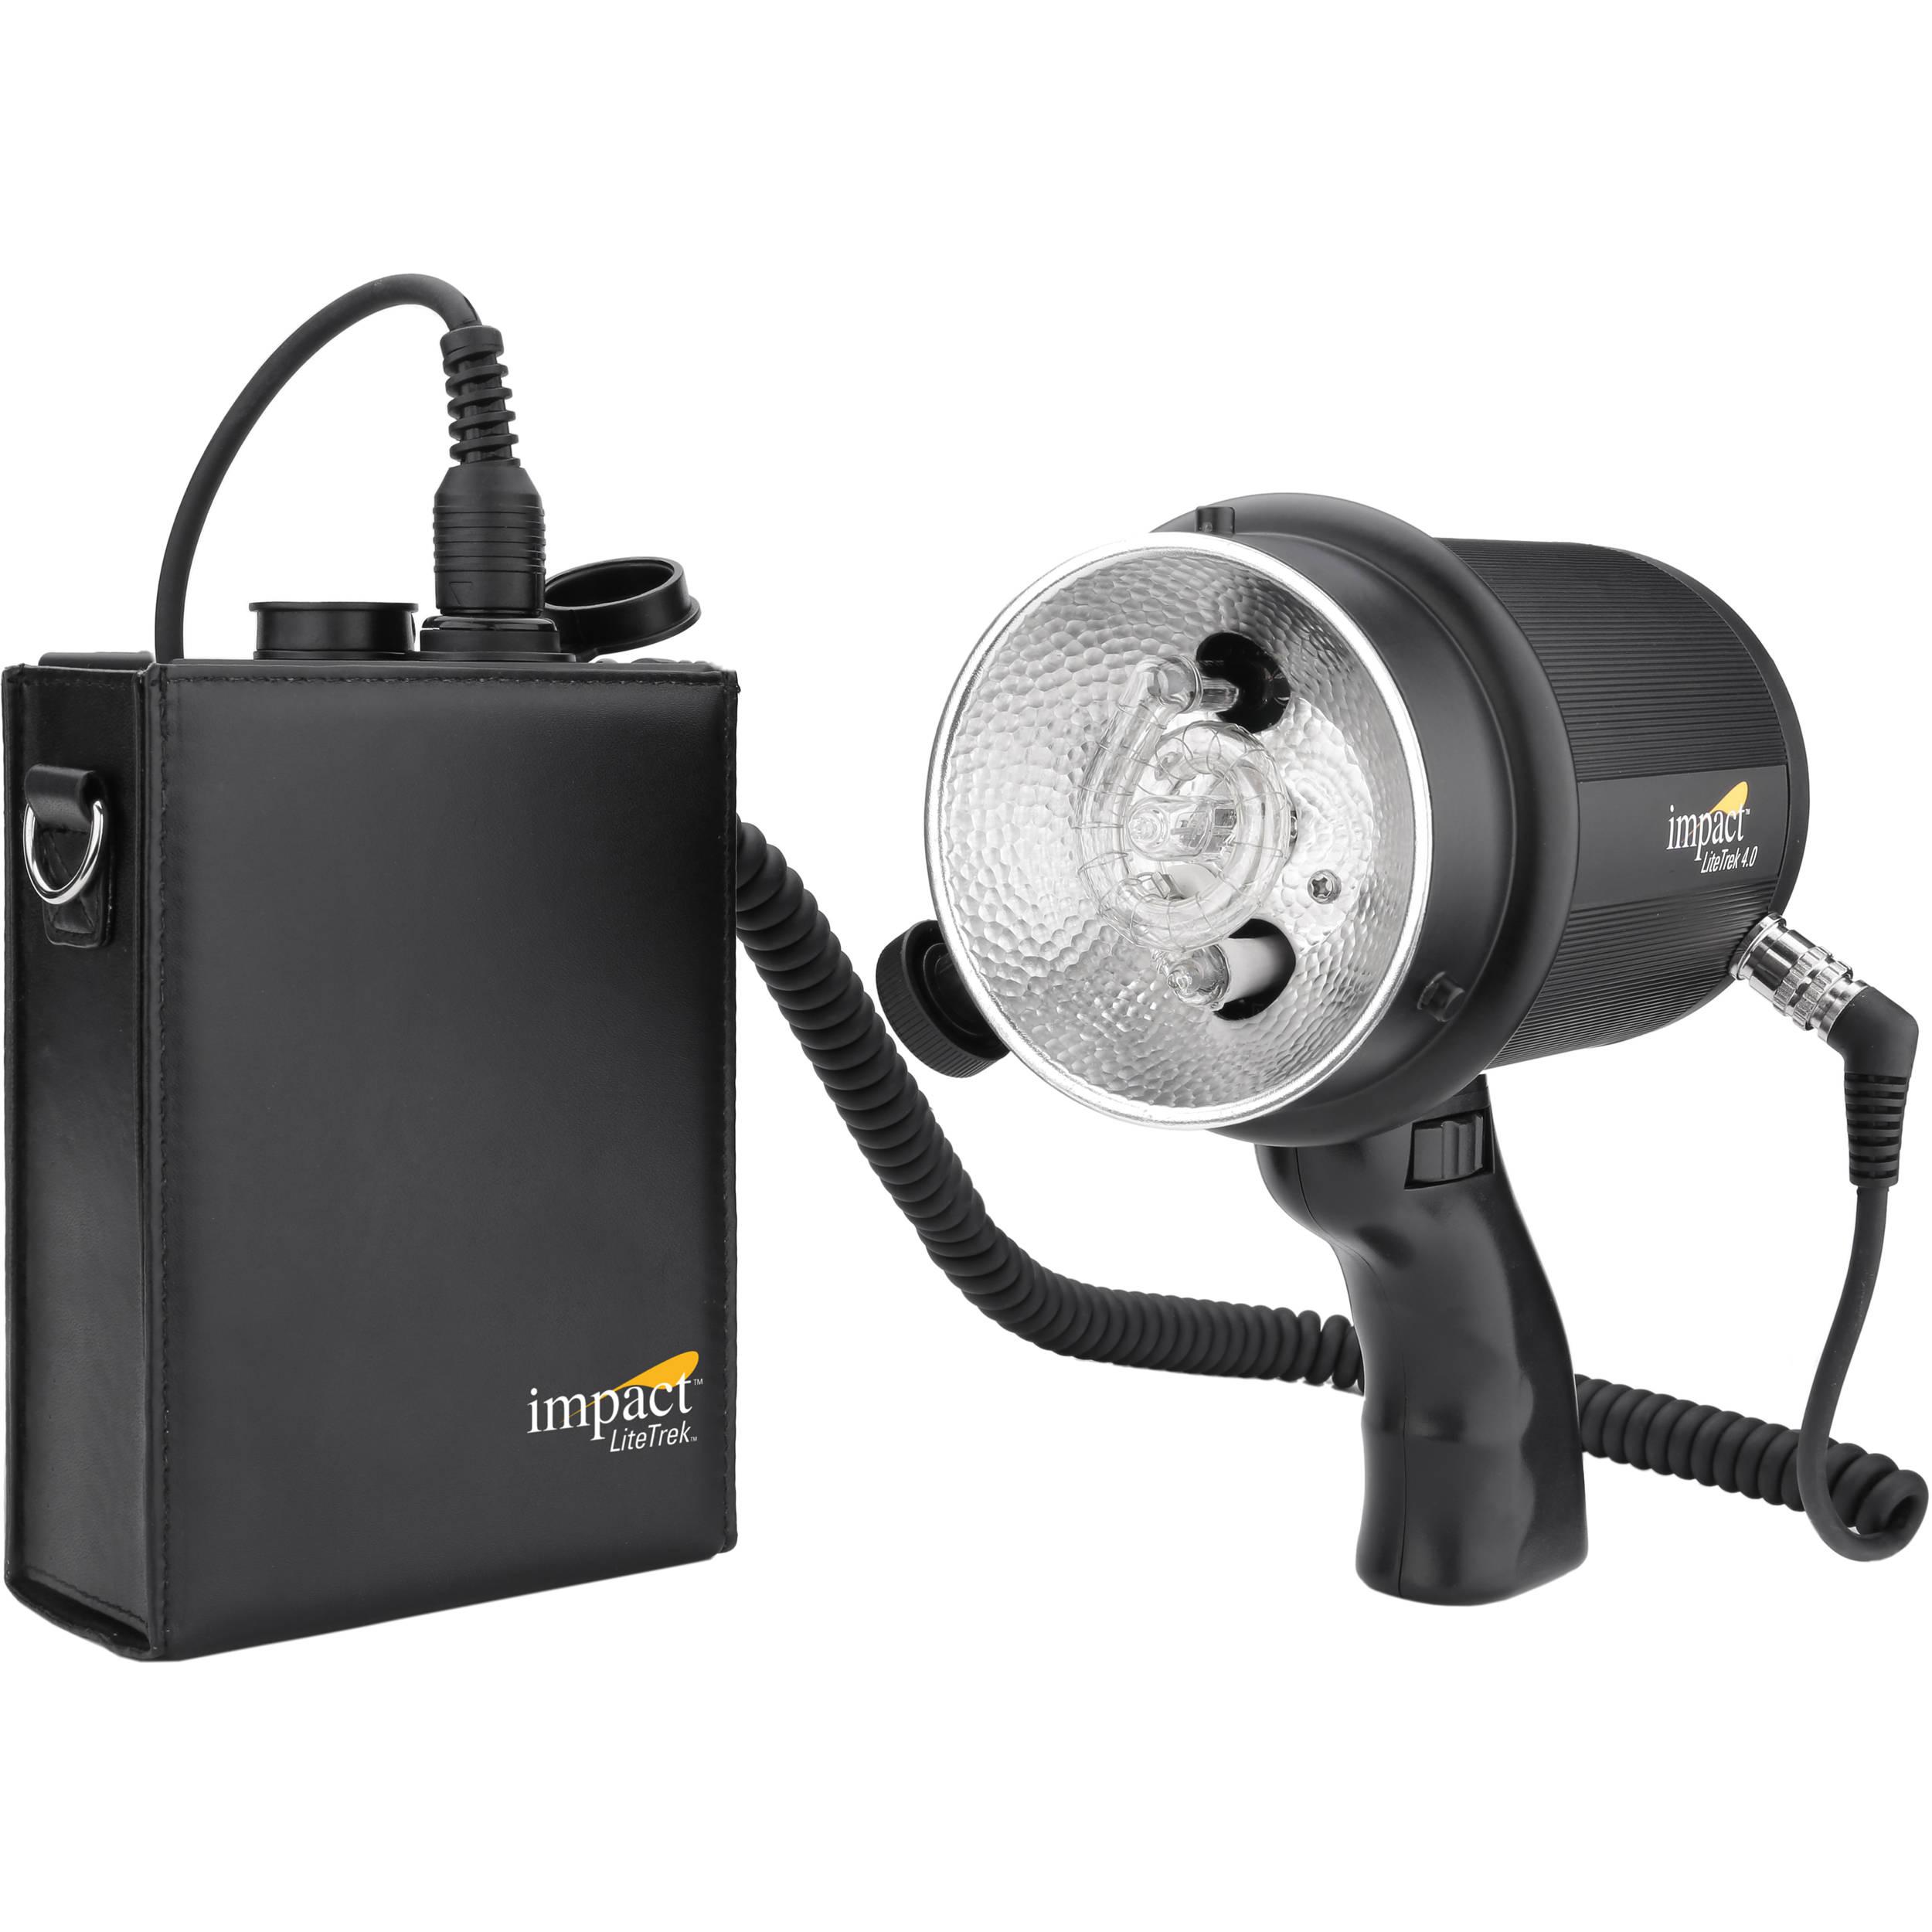 Impact Litetrek 4 0 Dc Monolight And Mini Lt Battery Pack Kit